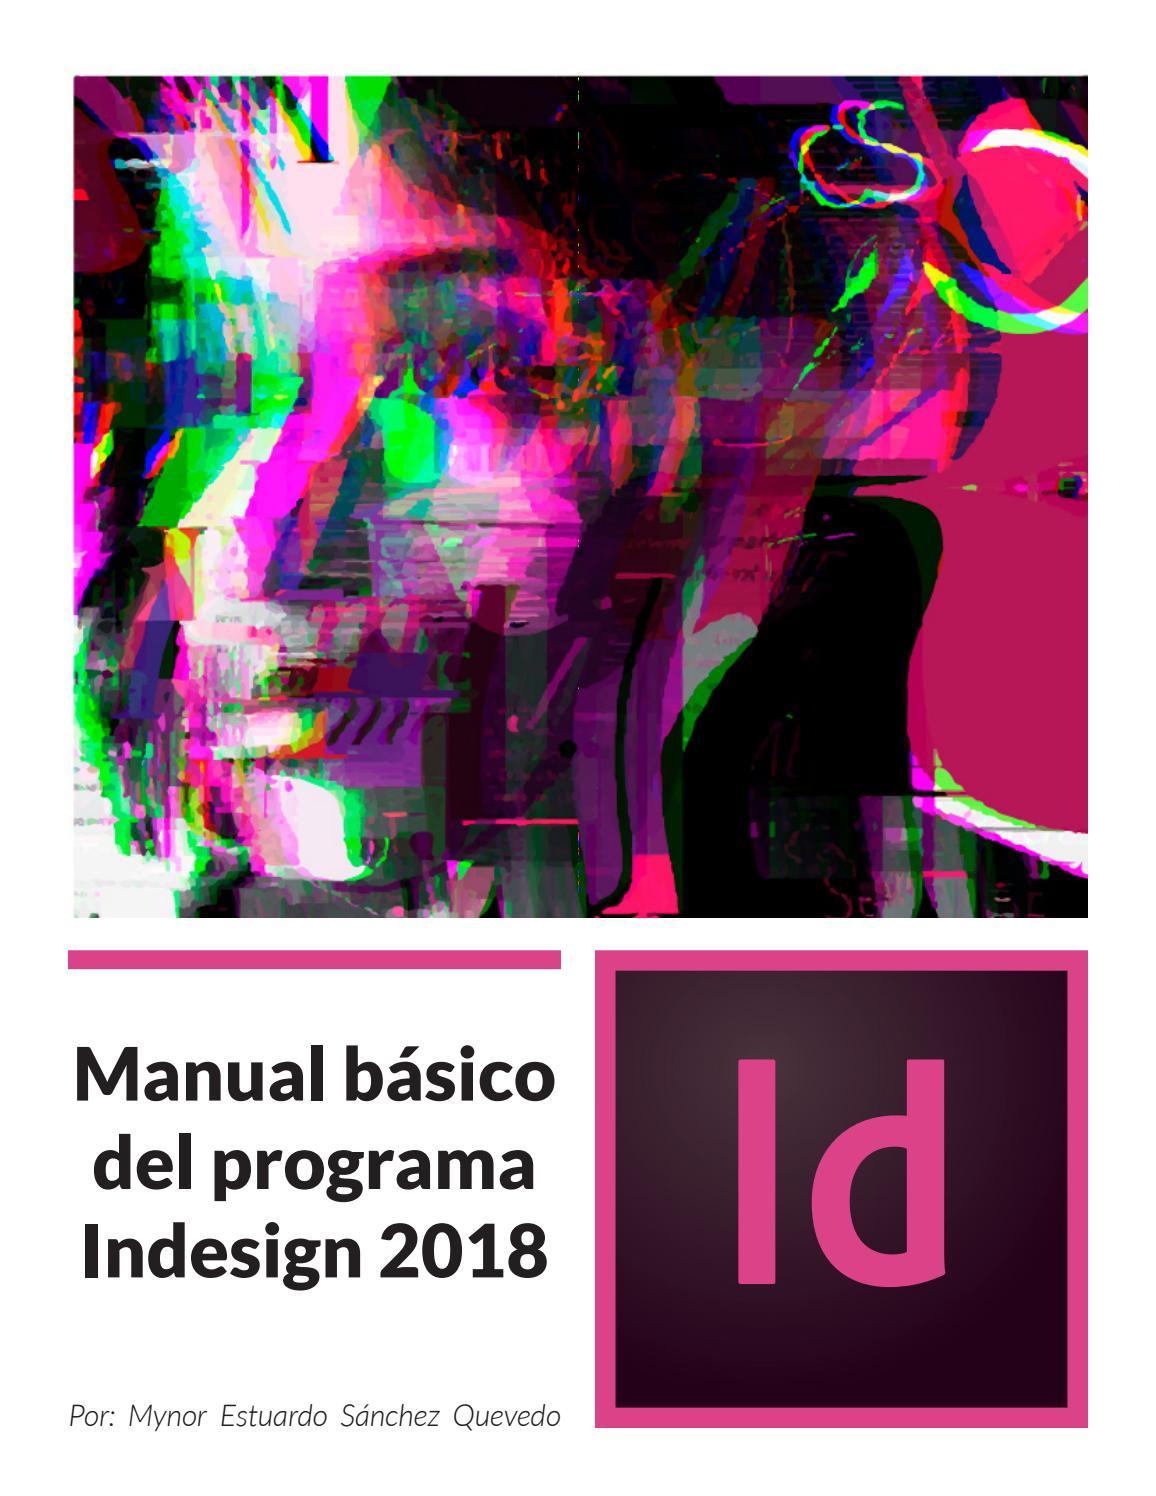 Manual básico del programa Indesign 2018 by mysanz - issuu